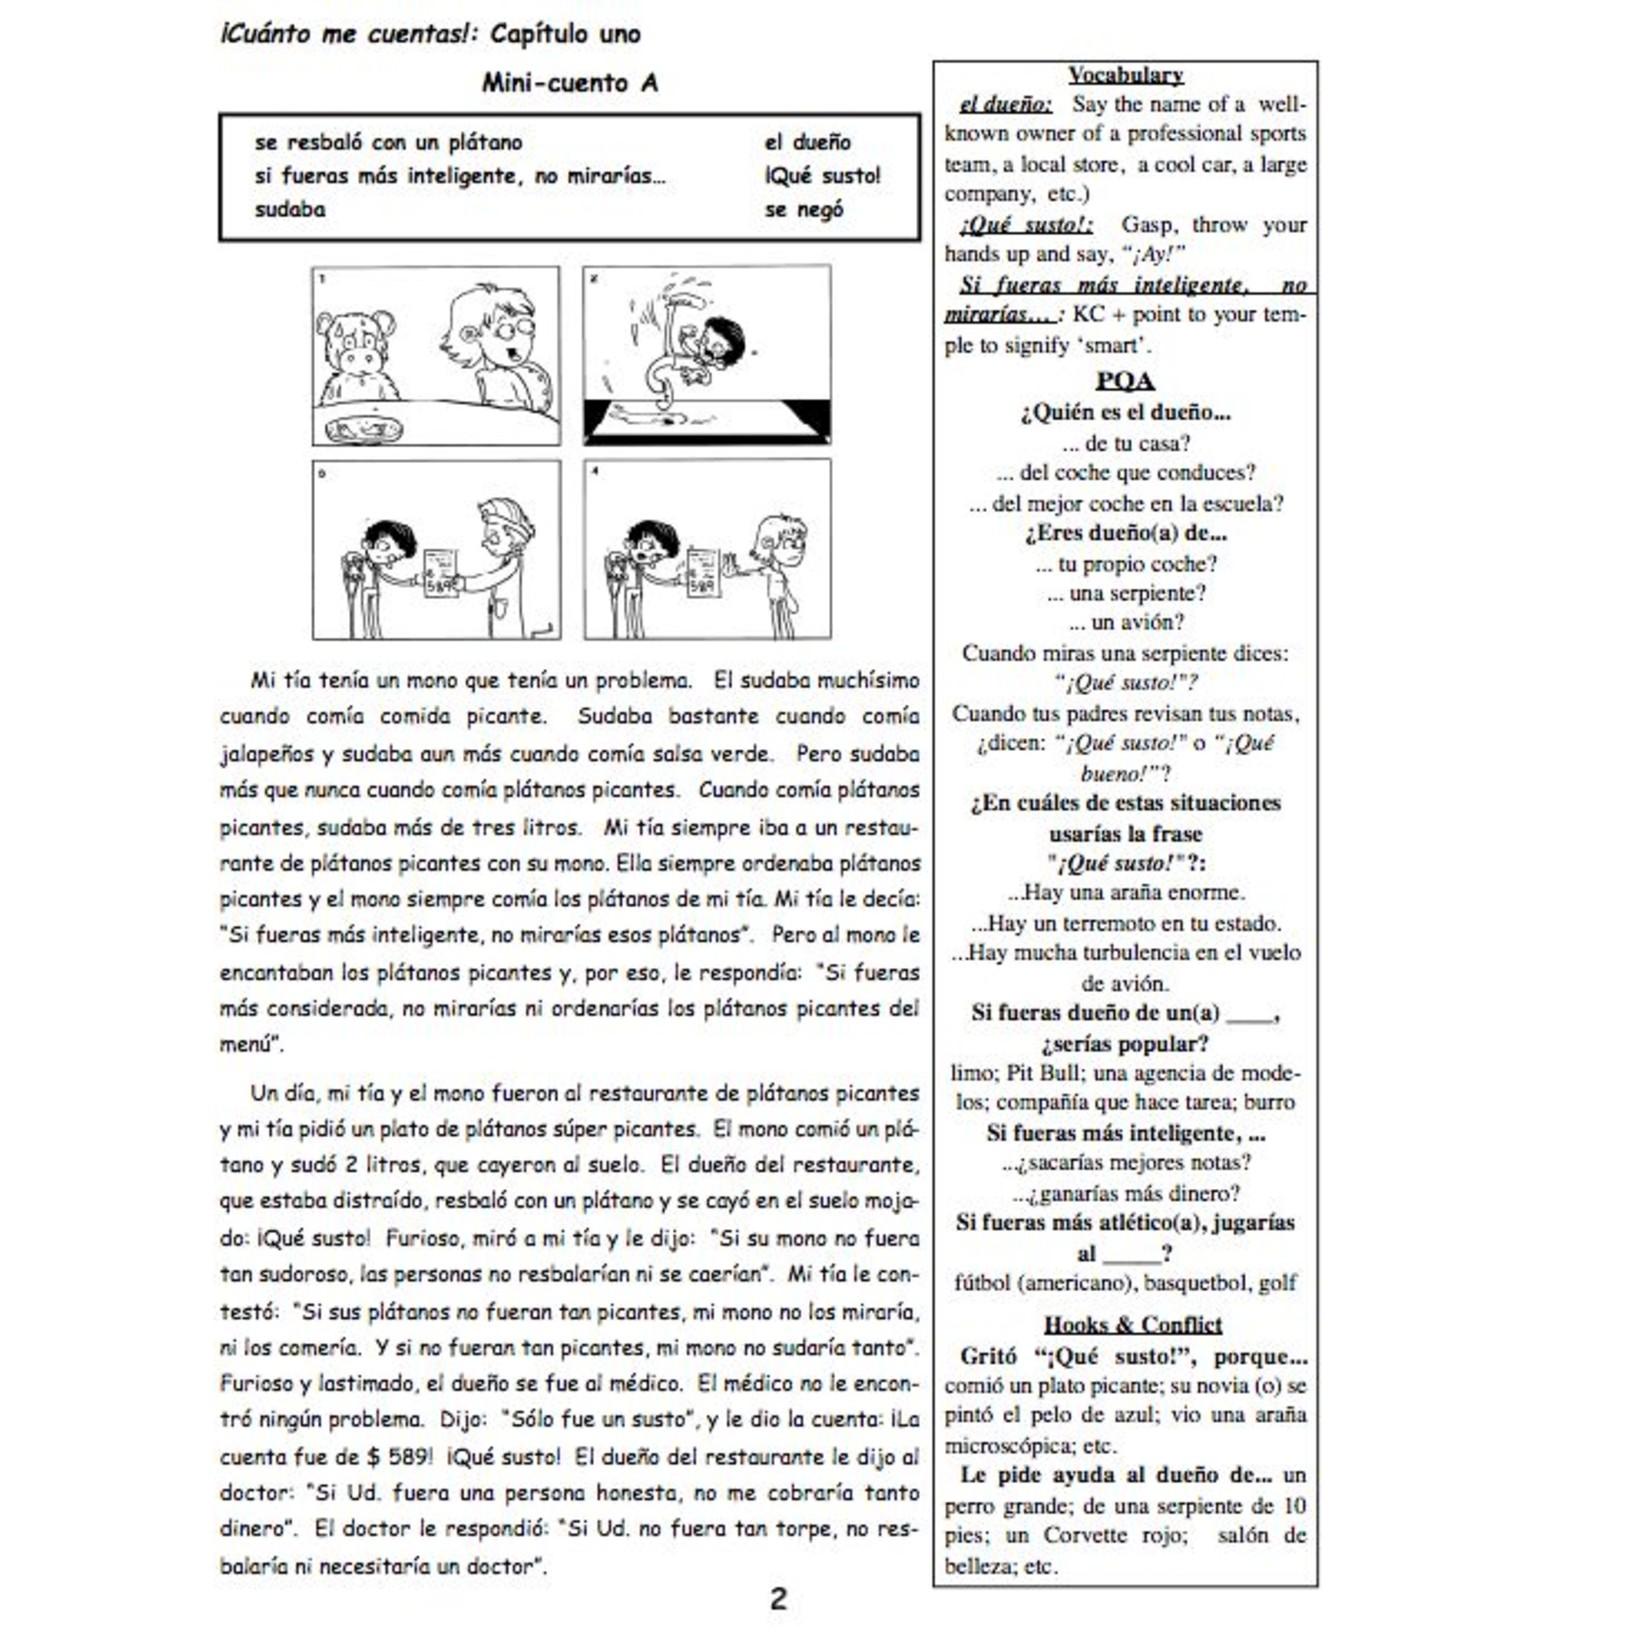 Fluency Matters ¡Cuánto me cuentas! Teacher's Manual